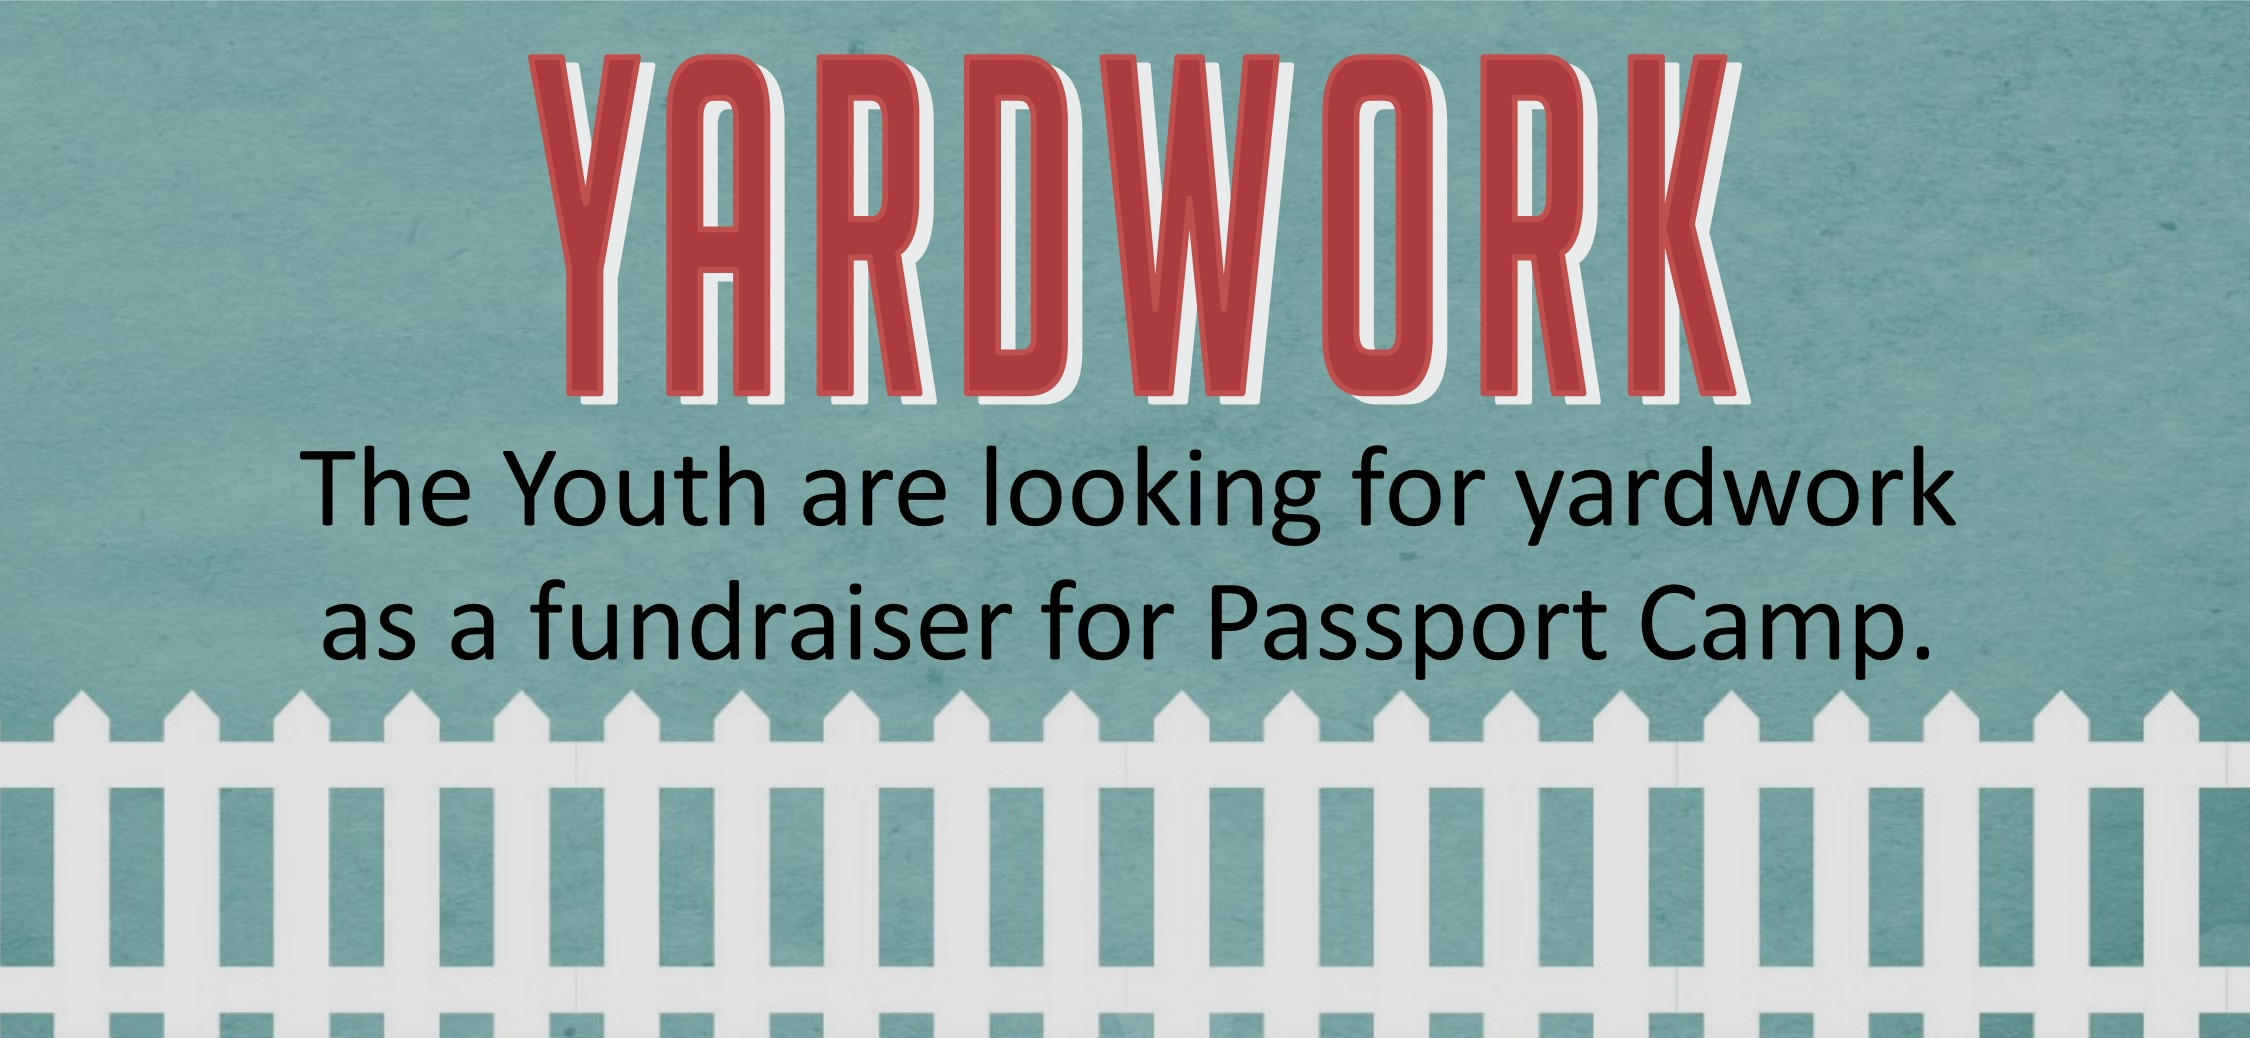 Yardwork Youth Web Page Slide  050618.jpg